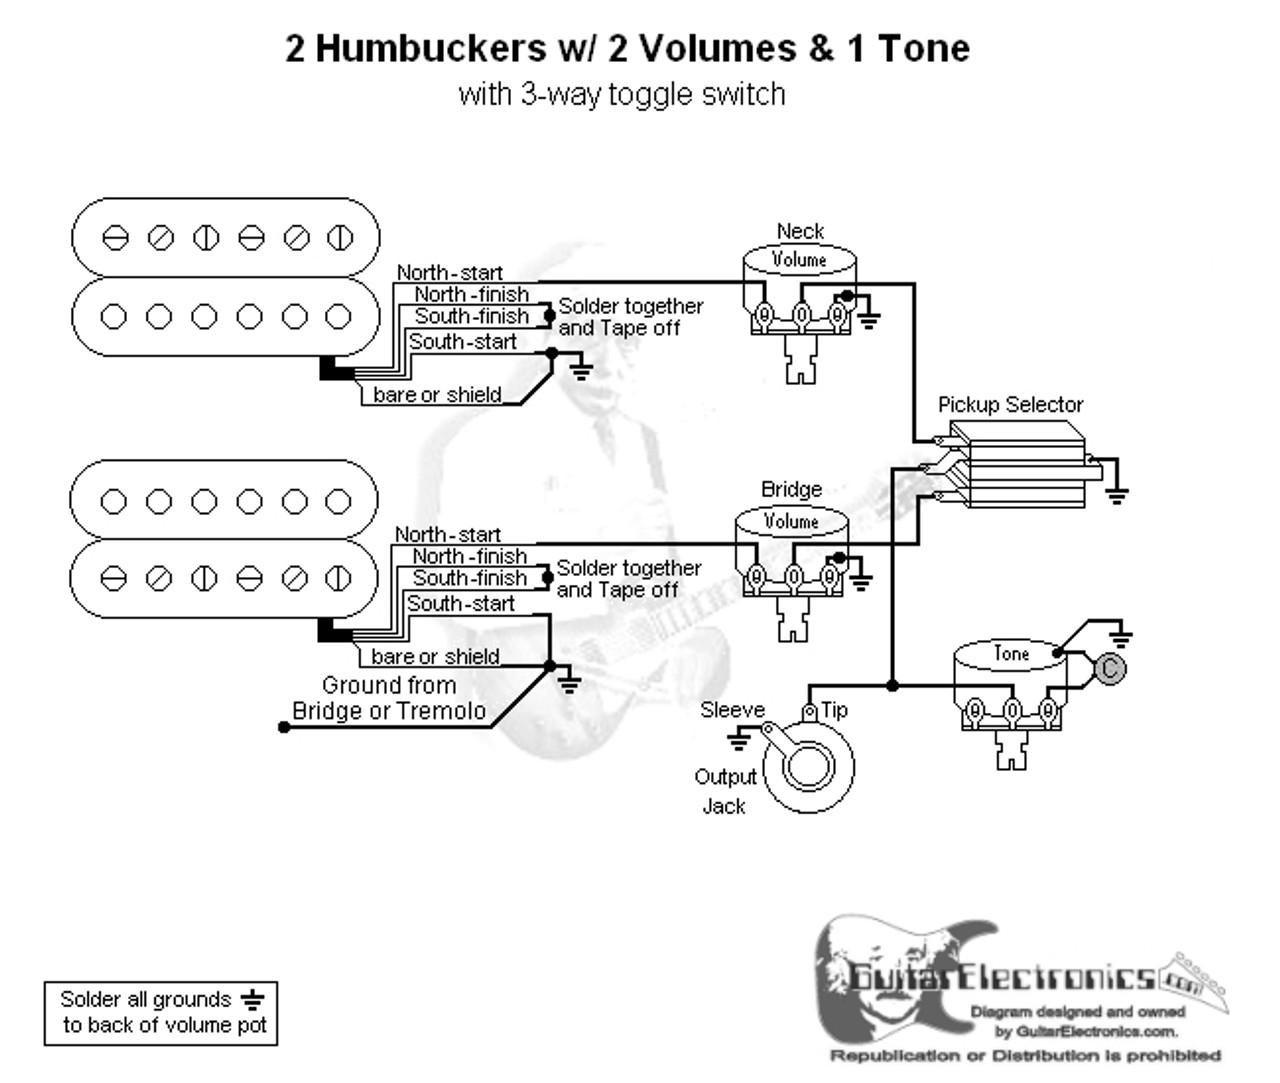 medium resolution of wiring diagrams for 2 humbucker 2 volume 1 tone wiring diagram toolbox single pickup guitar wiring diagram 2 humbuckers 3 way toggle switch 2 volumes 1 tone